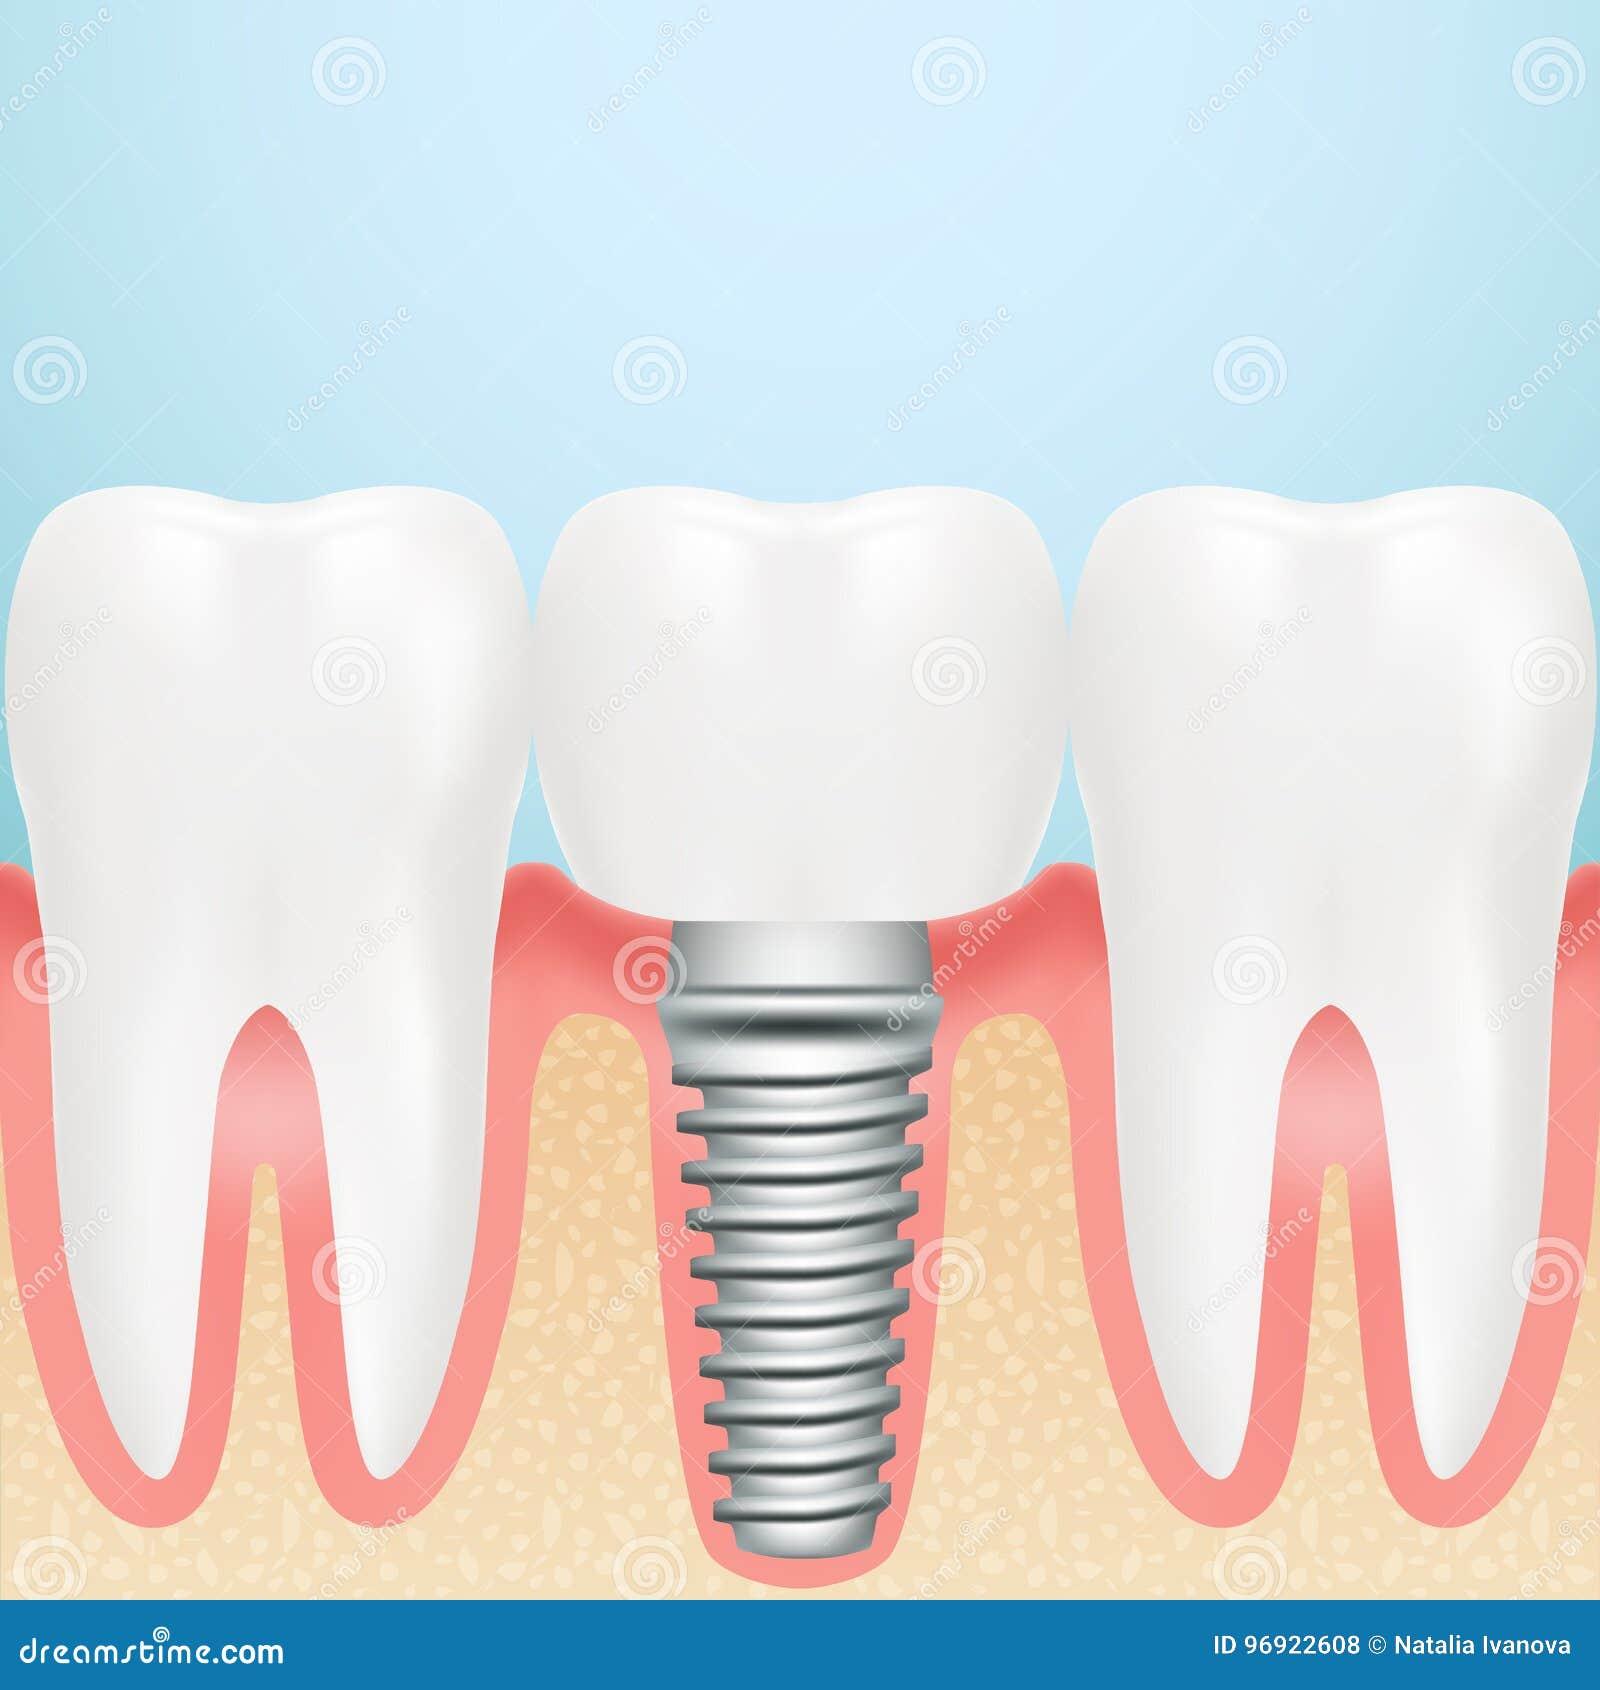 Realistic Dental Implant. Installation Of Dental Implant ... Dental Implant Background